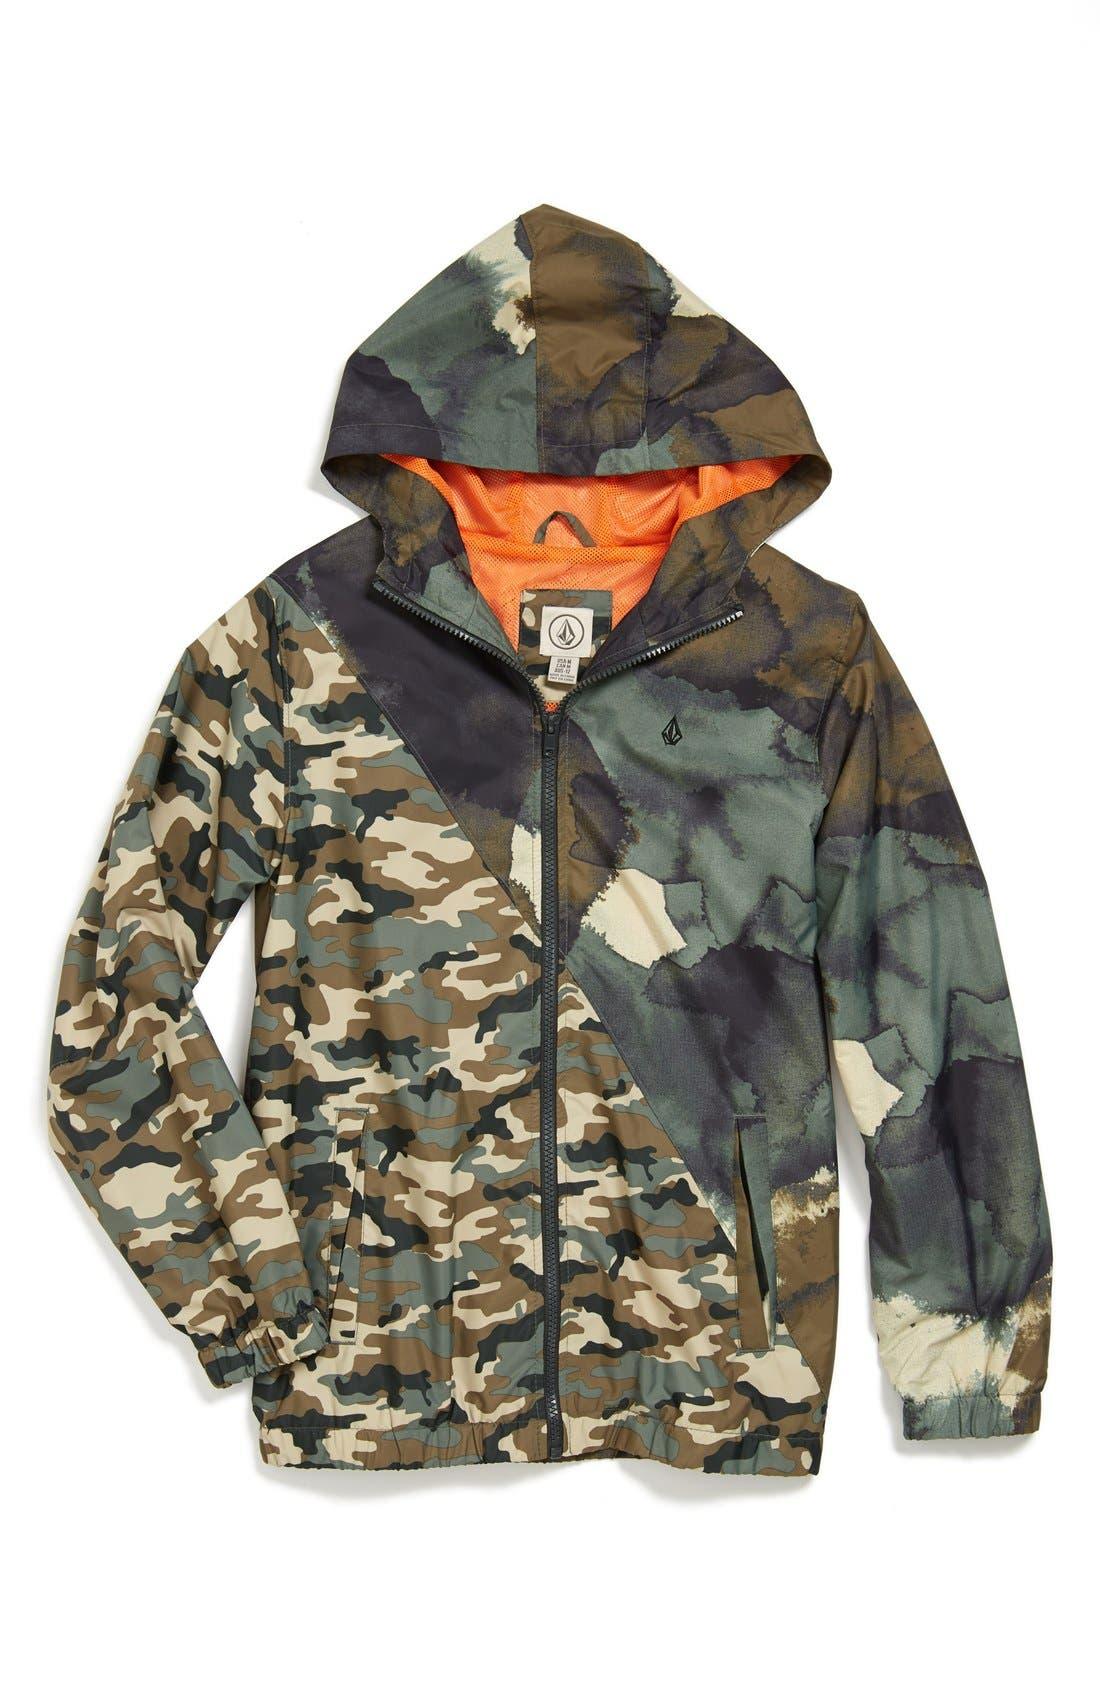 Alternate Image 1 Selected - Volcom 'Forwarder' Mixed Camo Jacket (Big Boys)